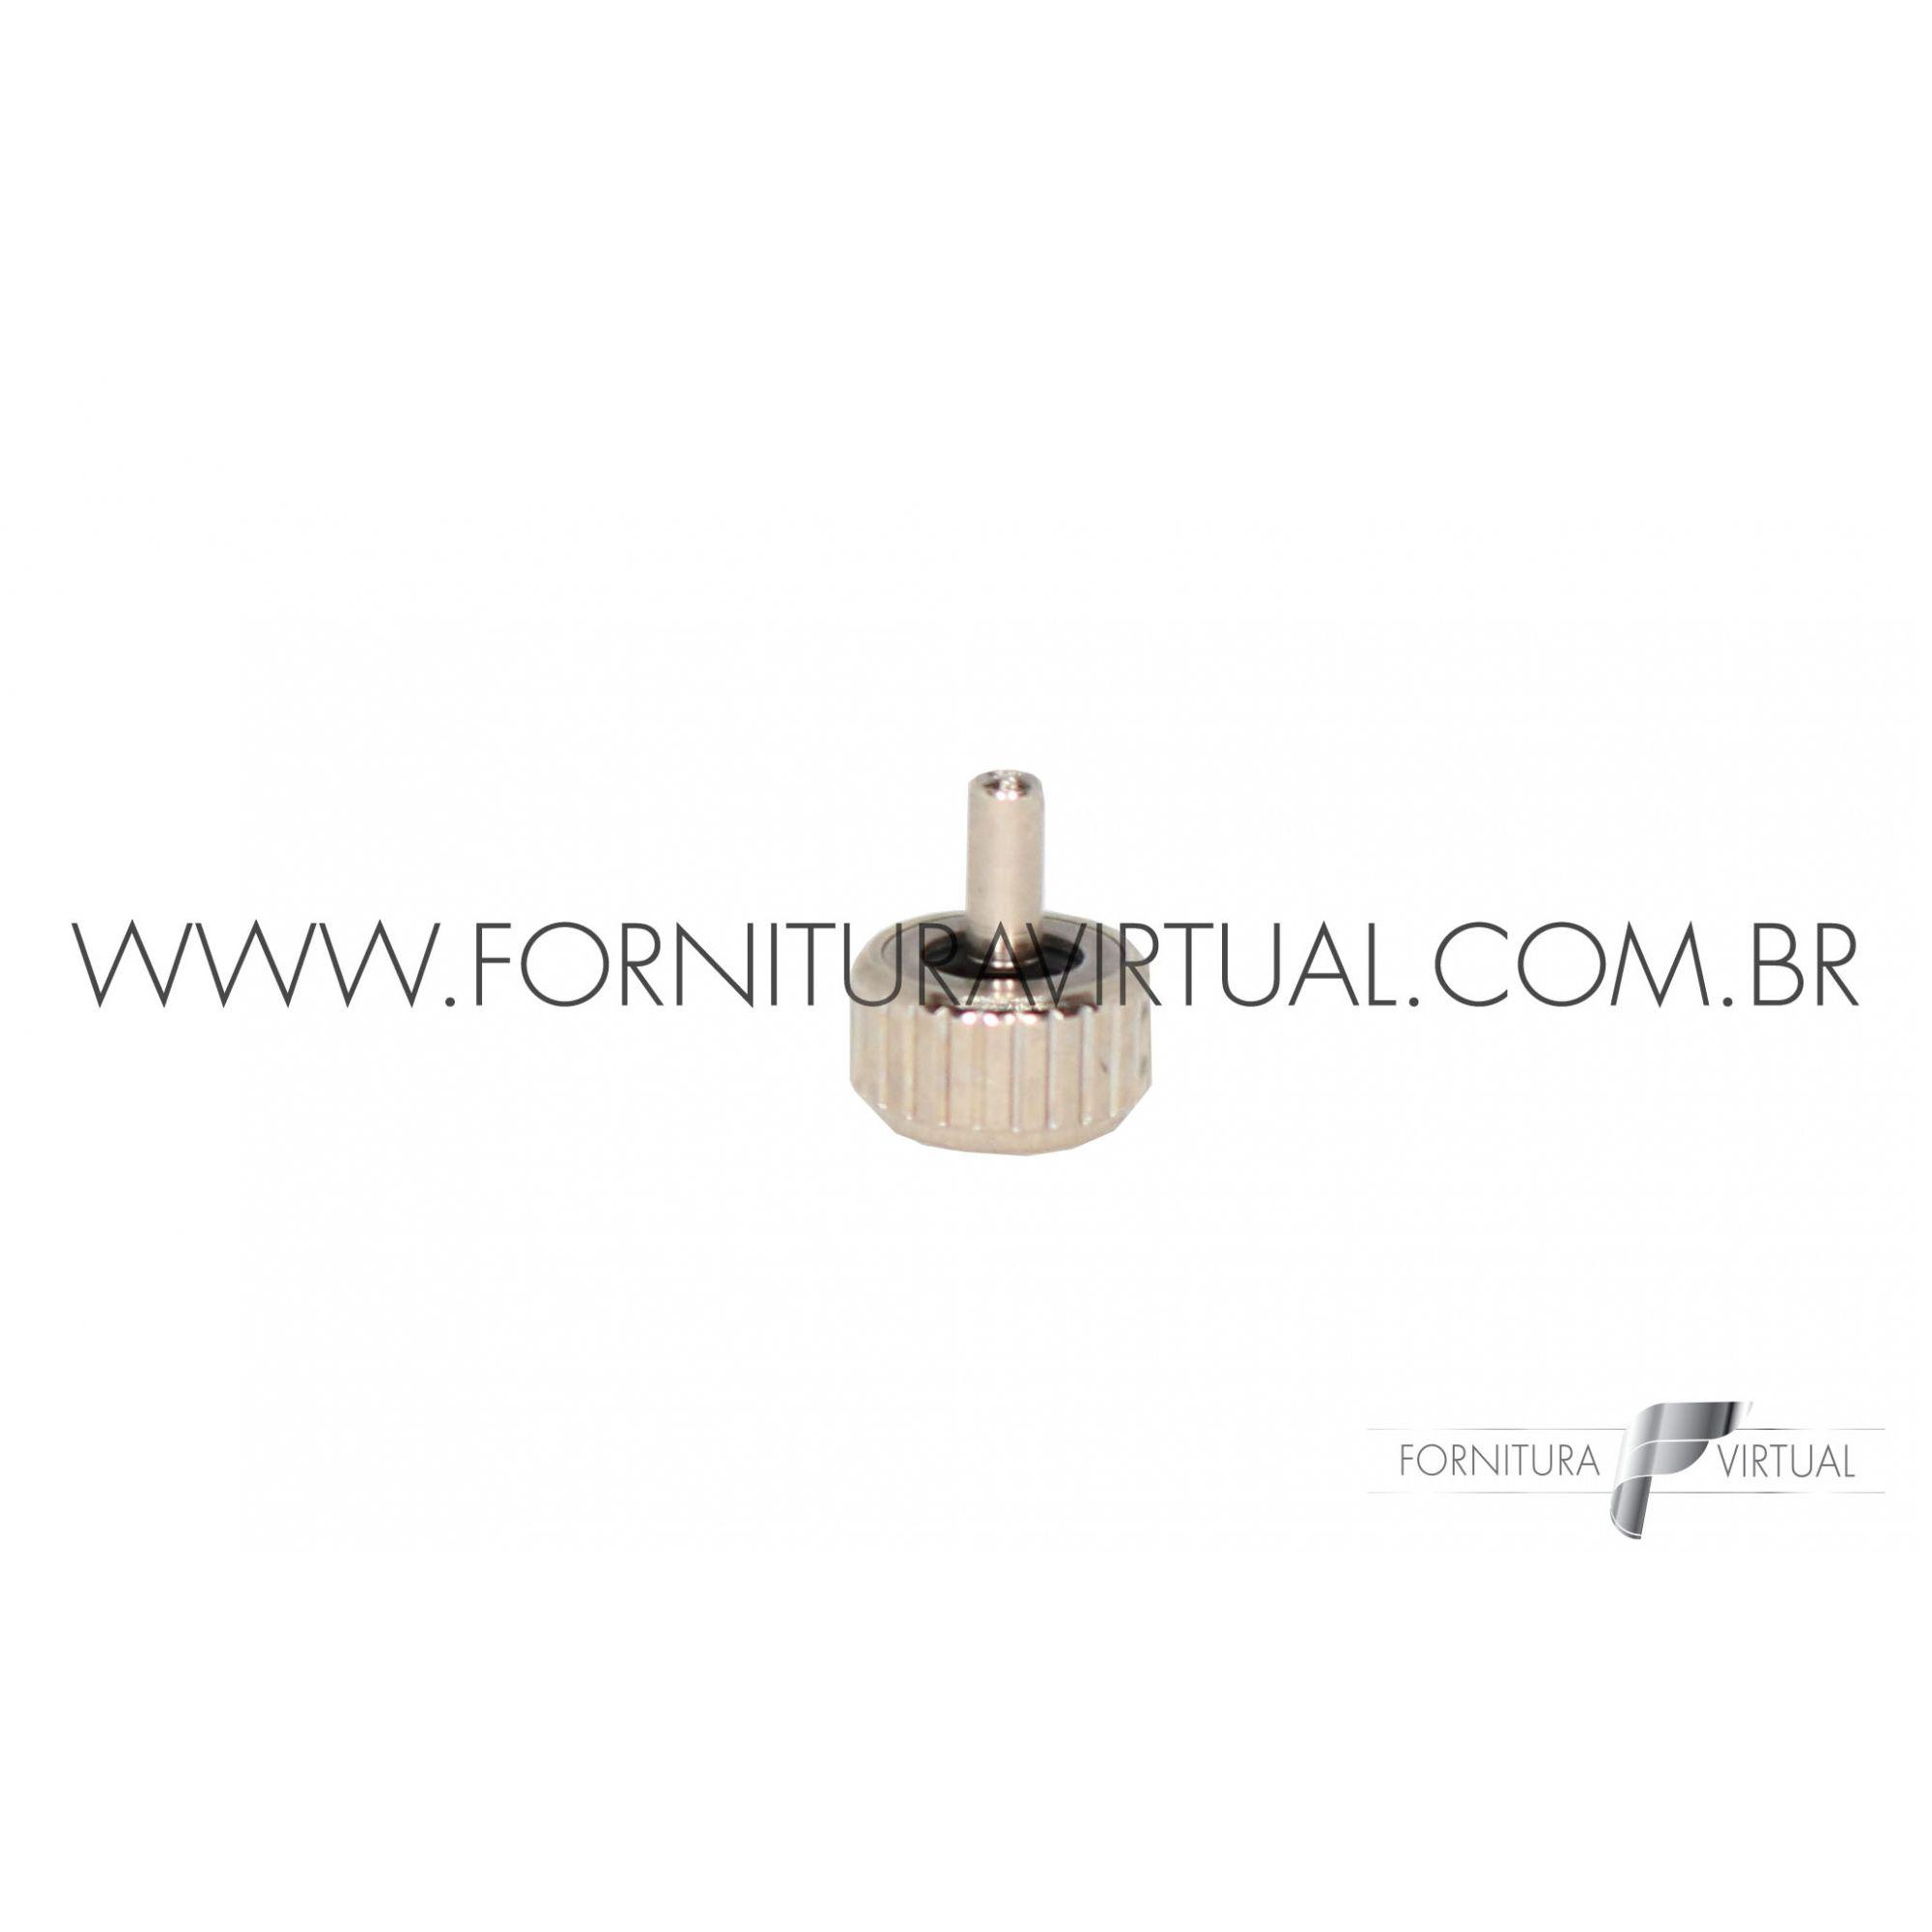 Coroa Capeada - 5.0 x 3.0 x 6.0 - Tubo 2.5